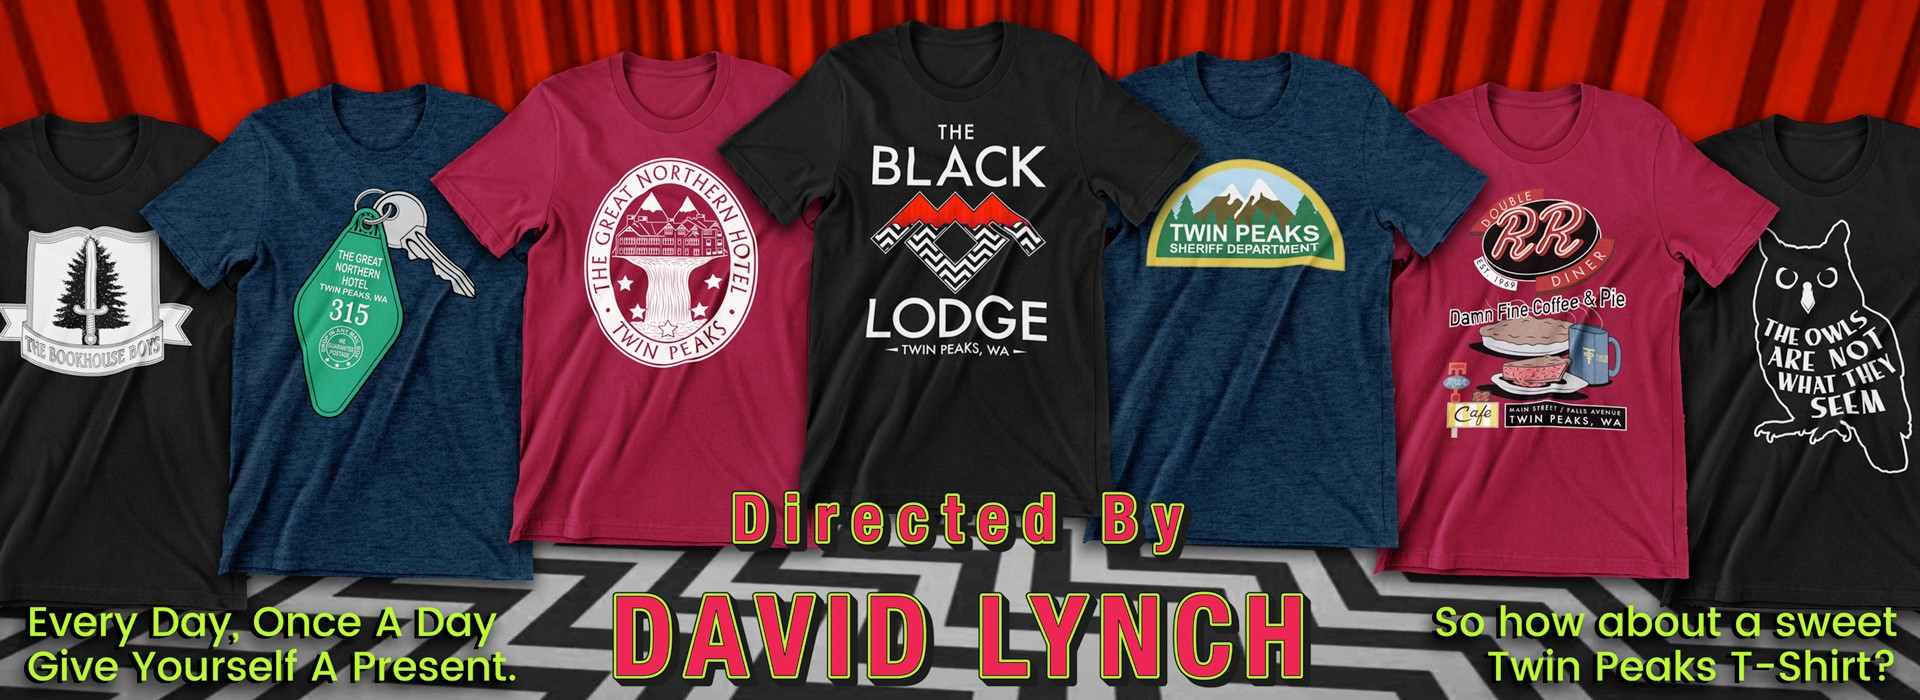 Twin Peaks T-Shirts